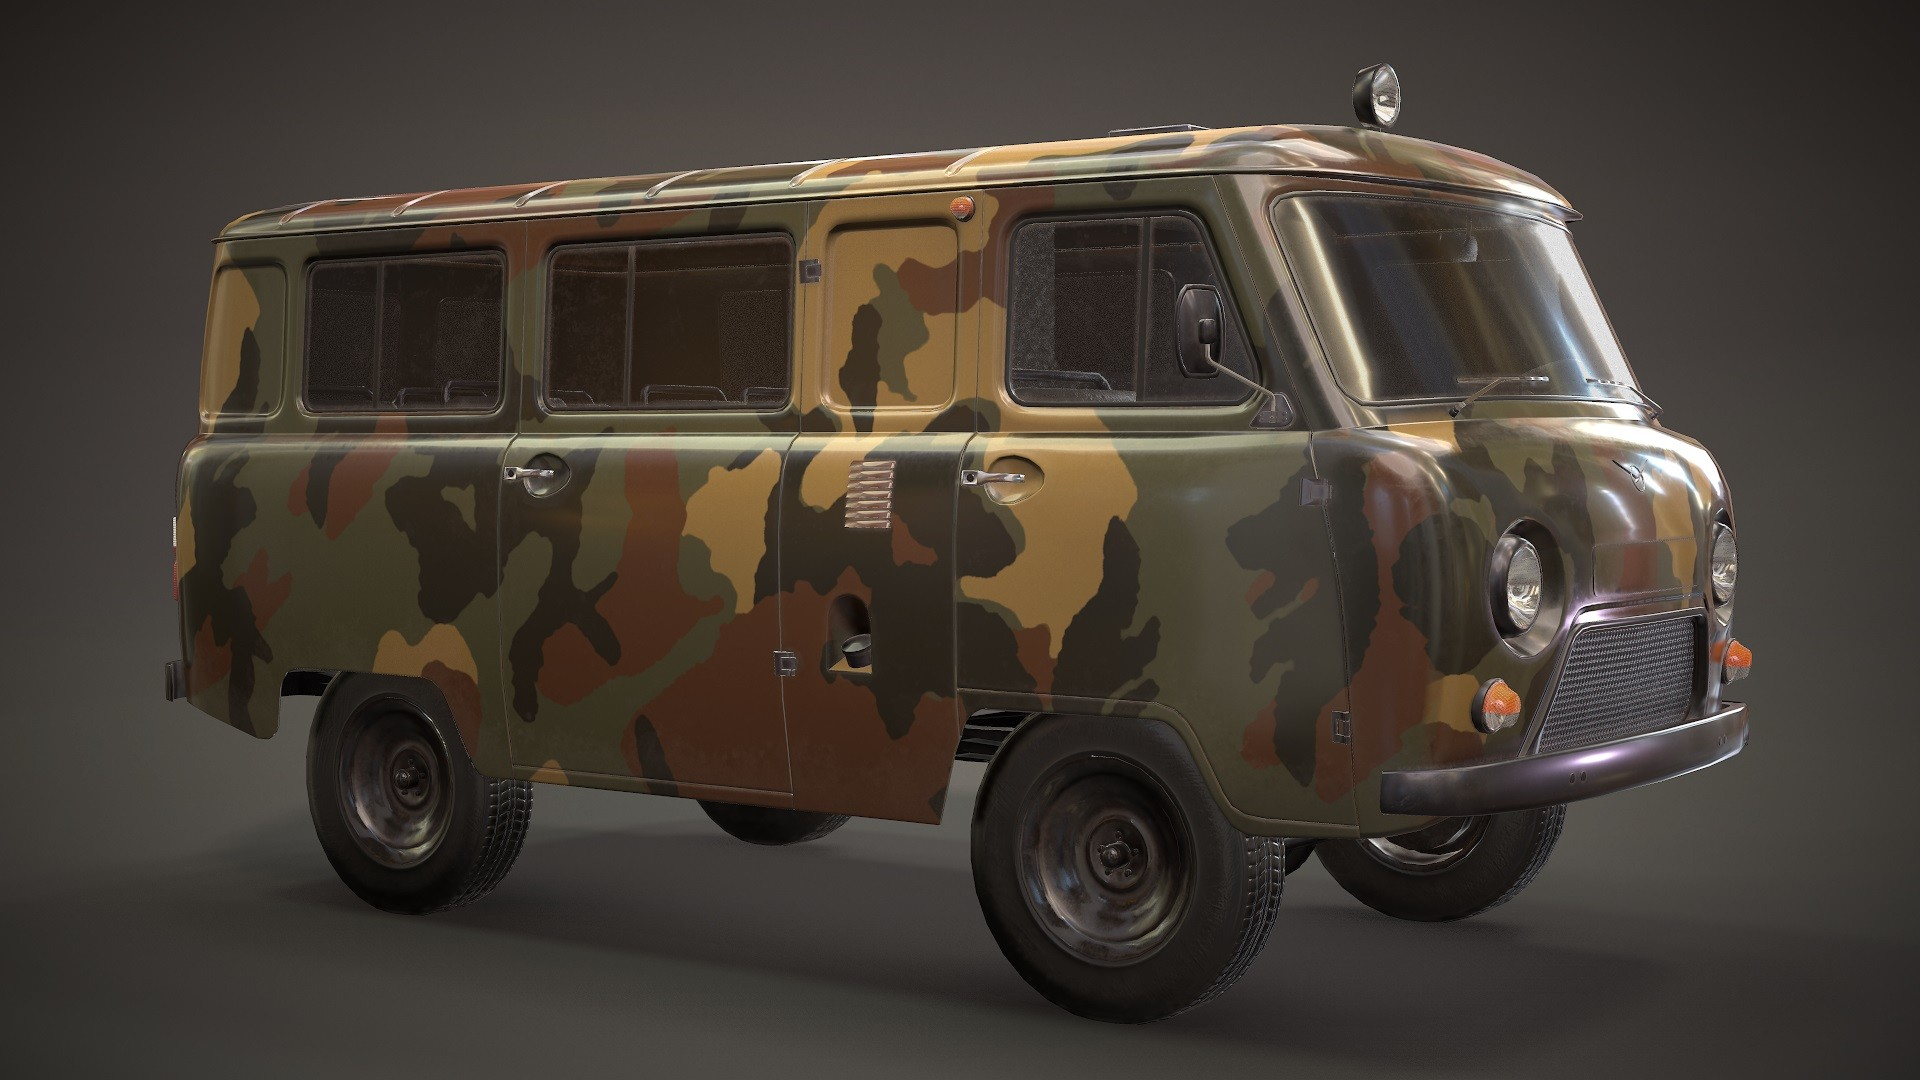 houstera-studio-uaz-452-2206-military-re